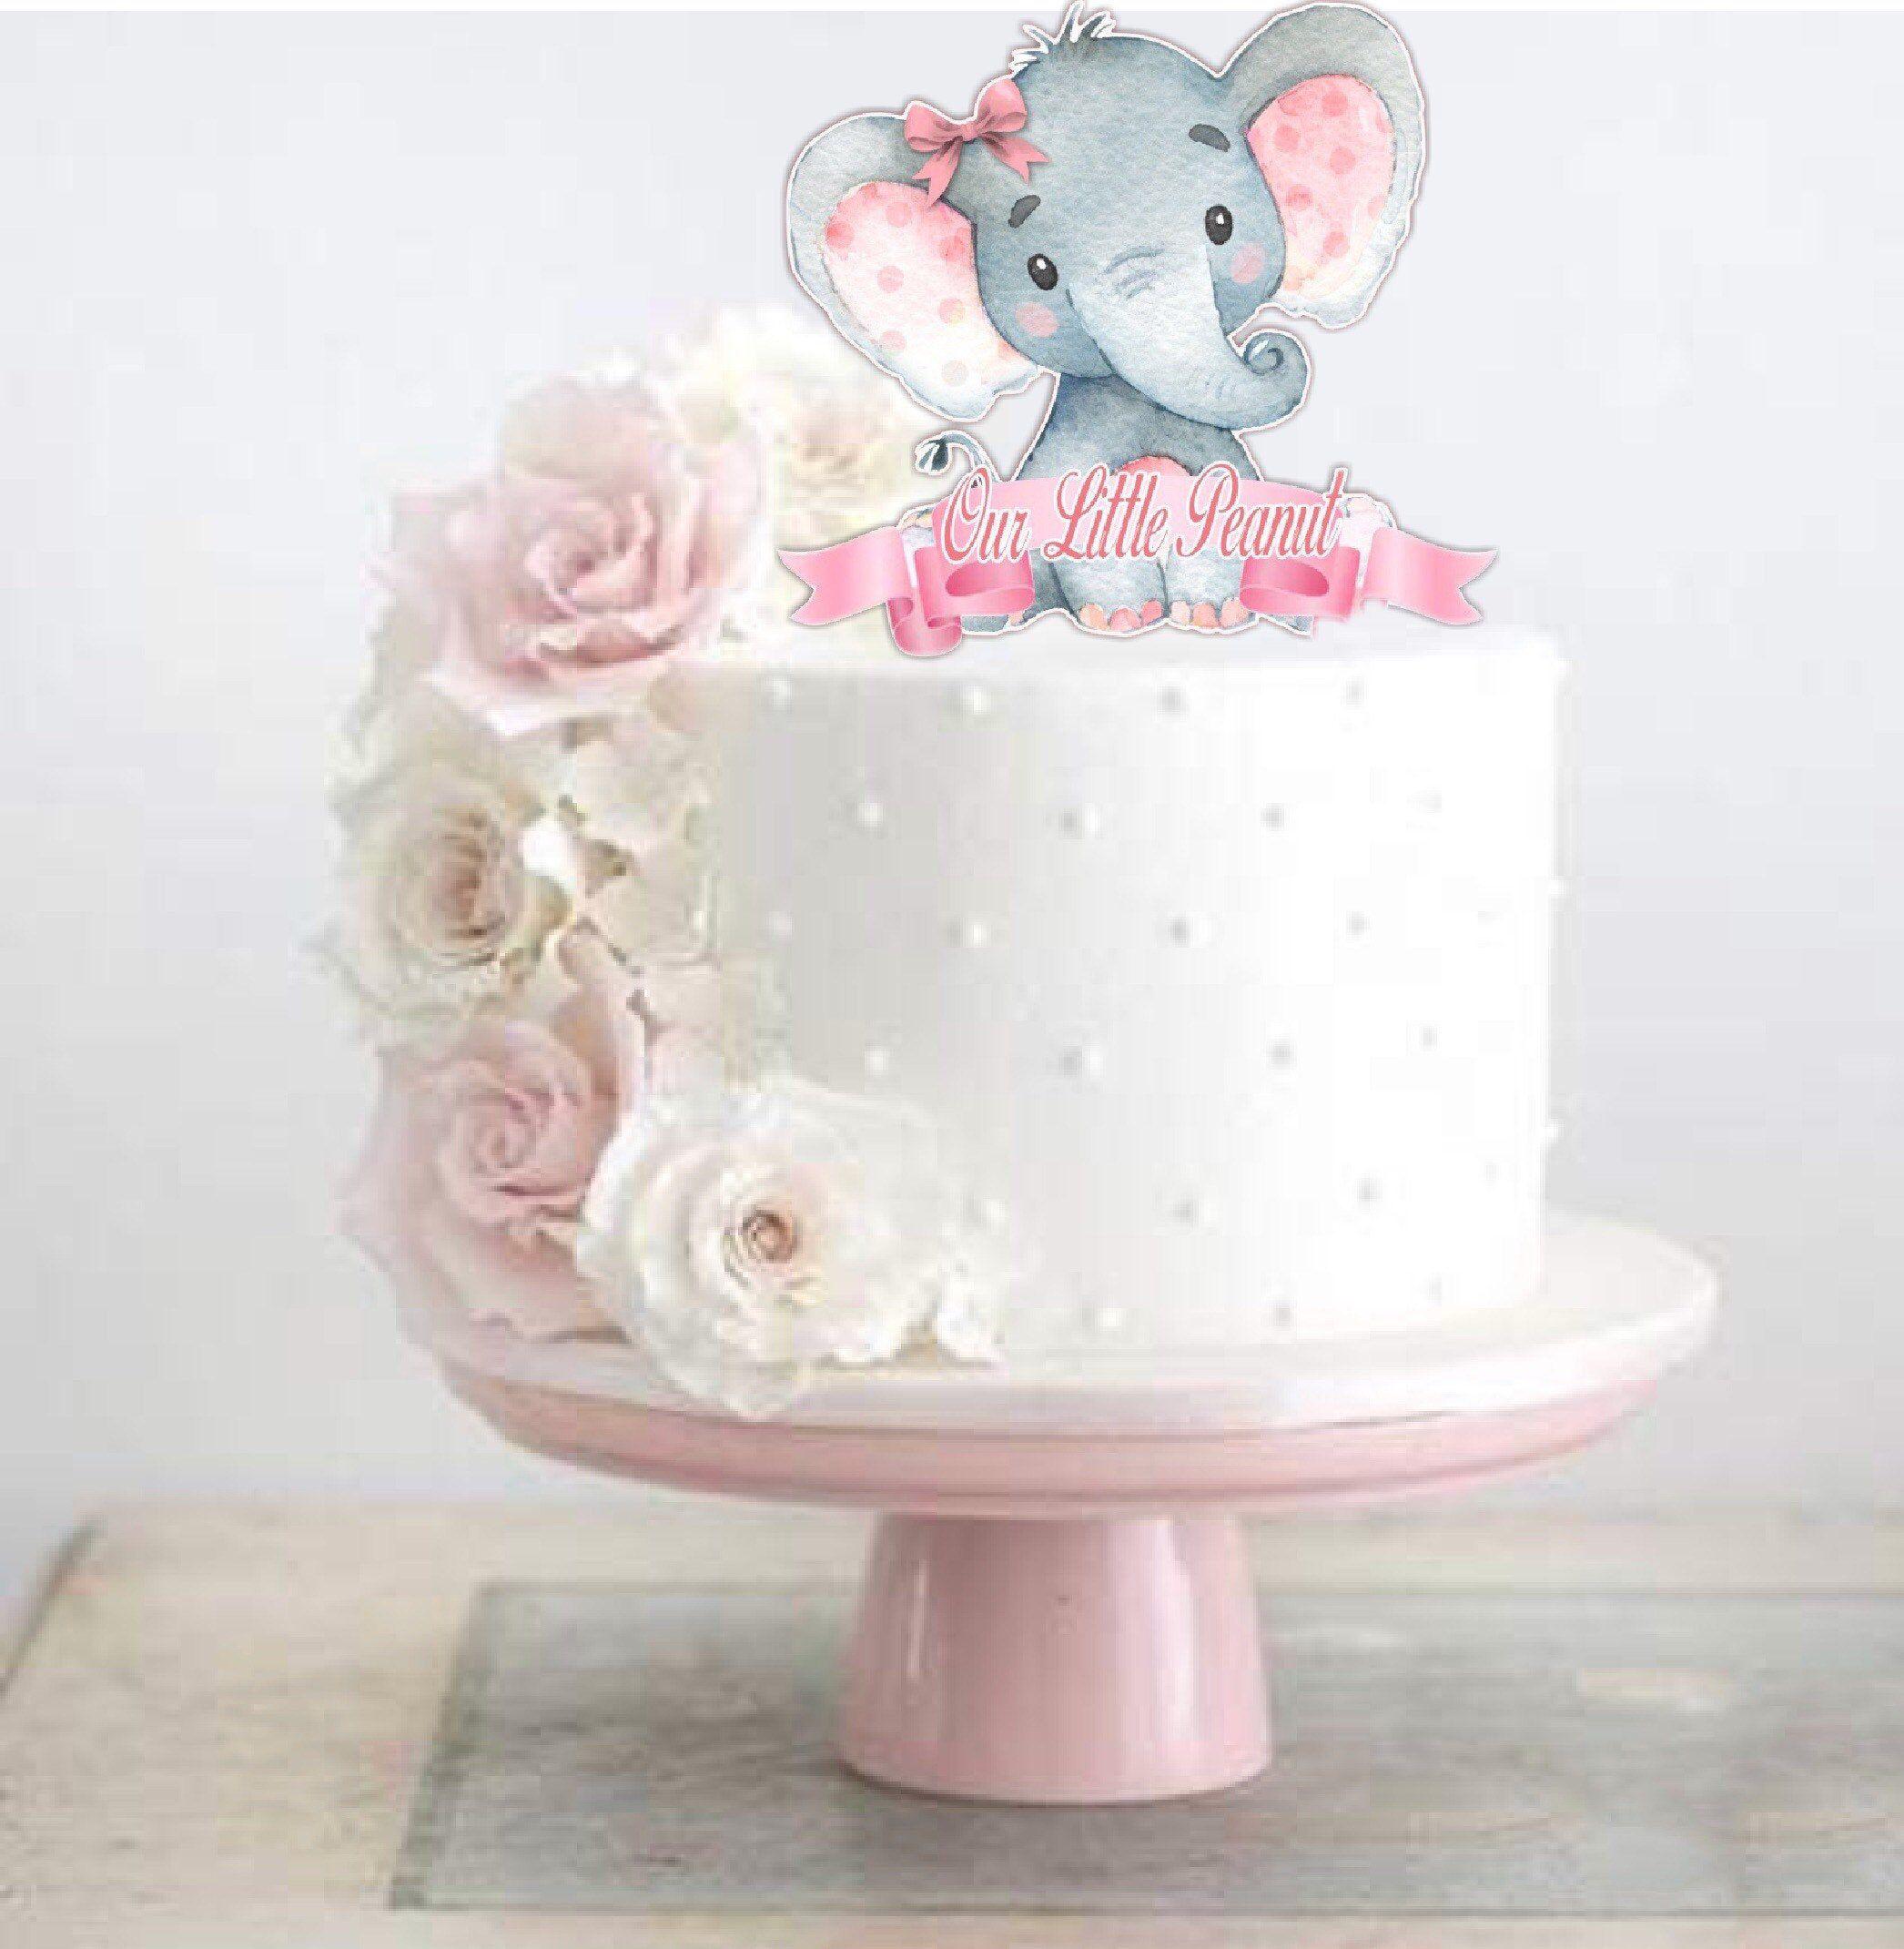 First Birthday Elephant Birthday Baby Shower Table Decoration Elephant Party Decor Elephant Baby Shower,Girl Baby Shower Elephant Theme